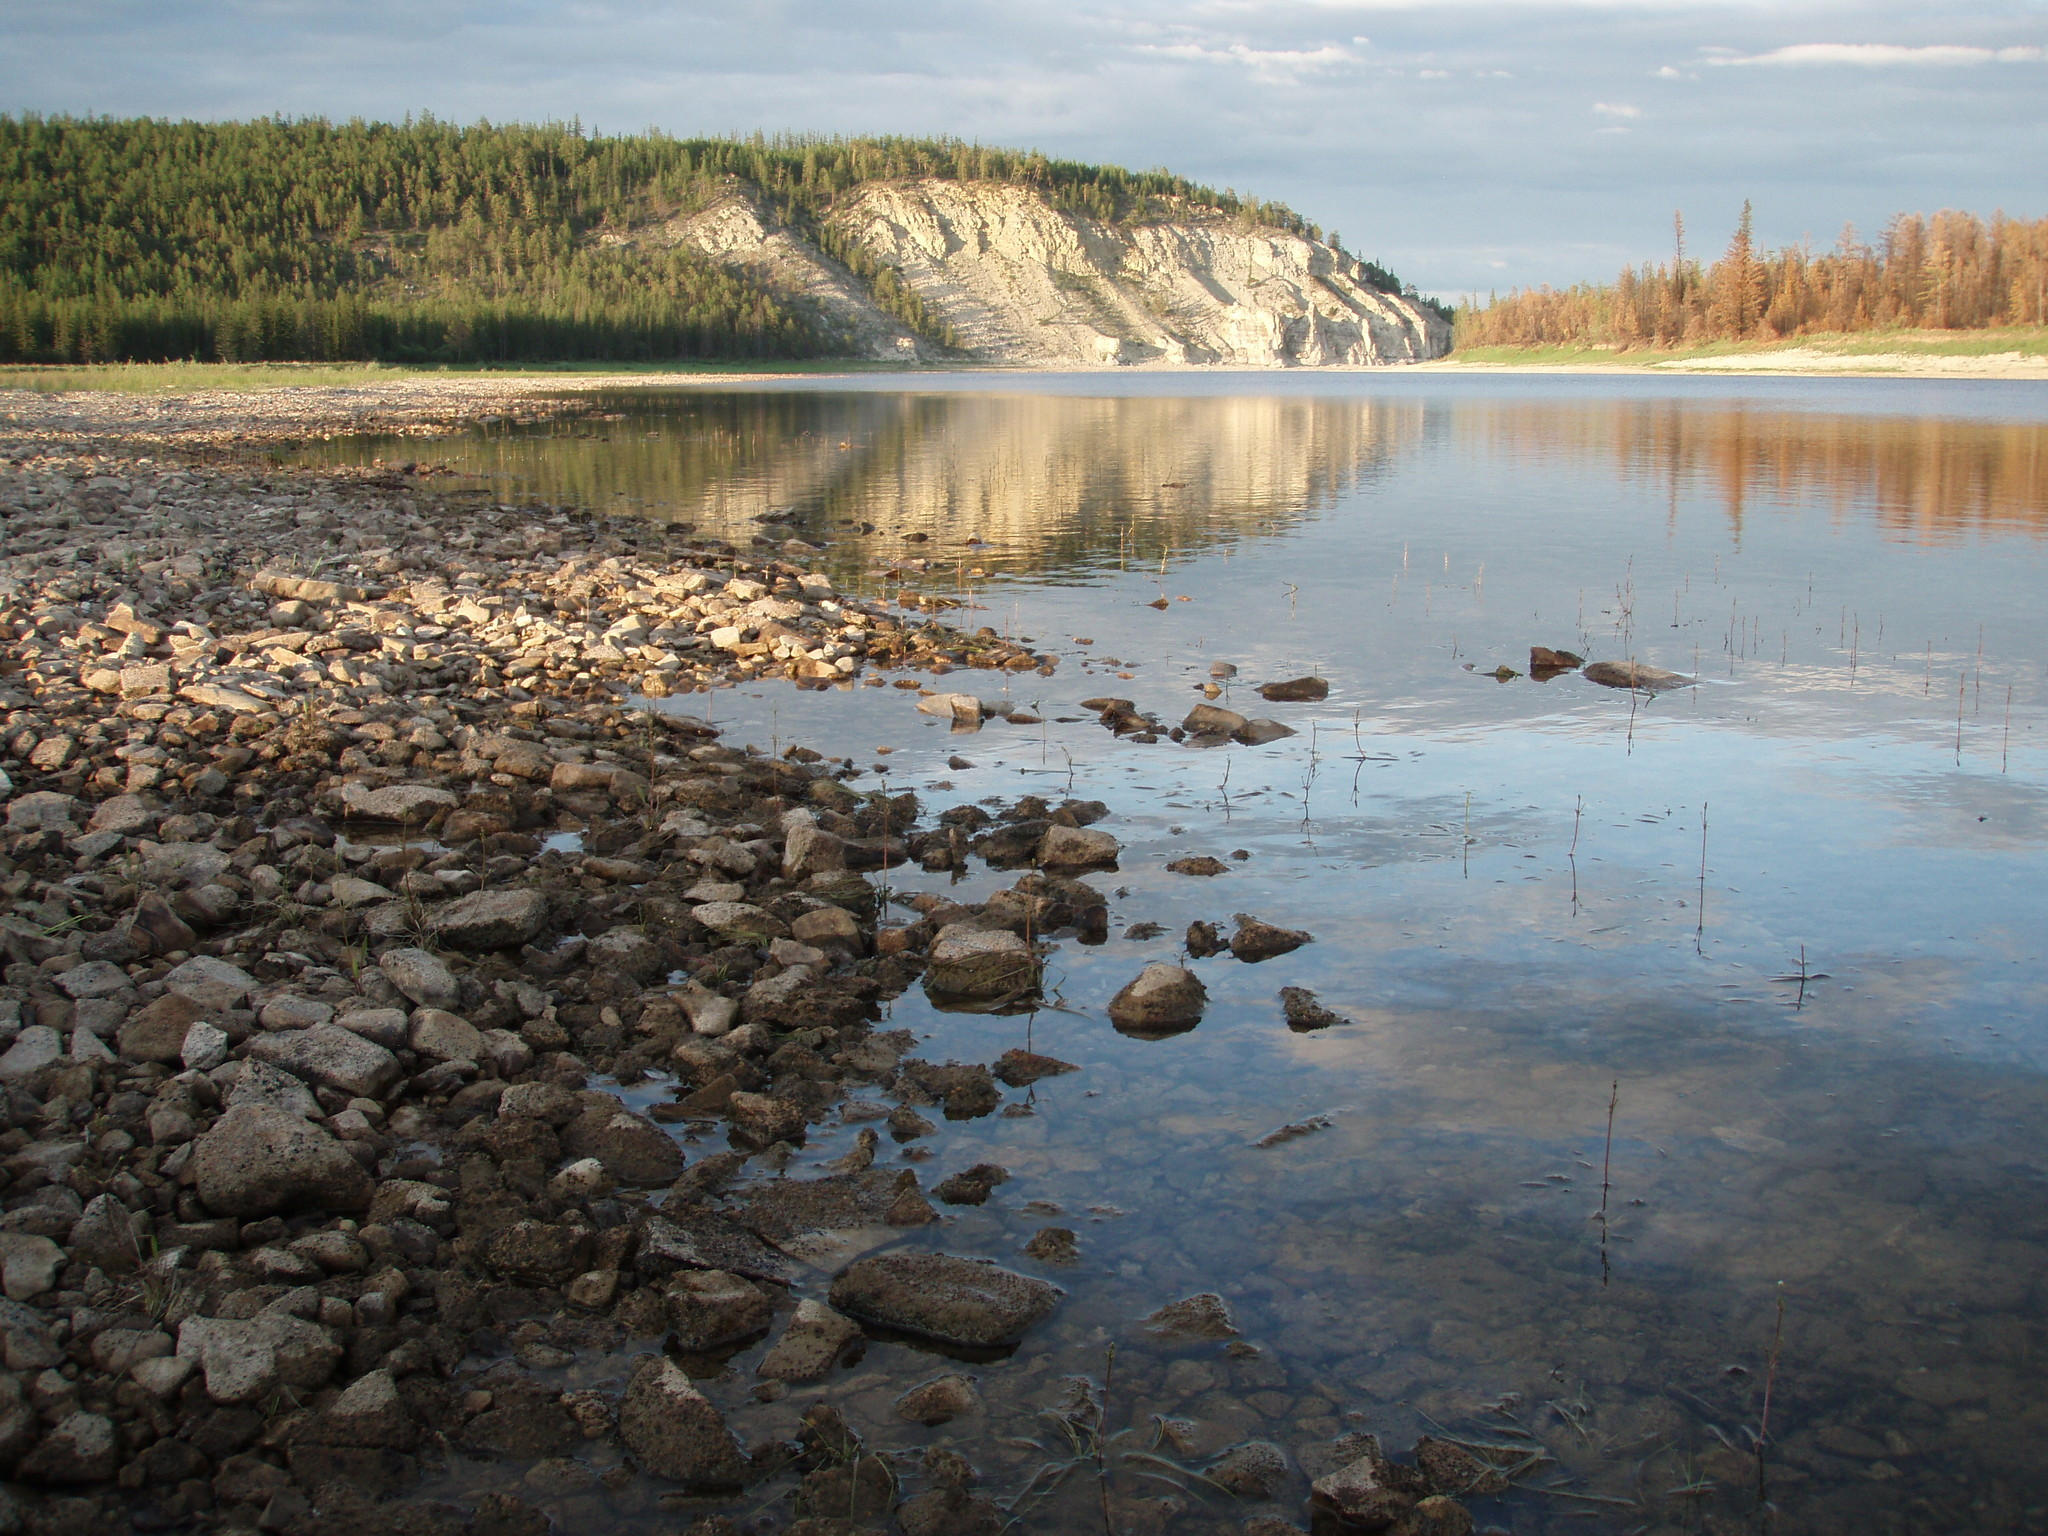 подъезде подвале чердаке улице лесу озере реке порно фото